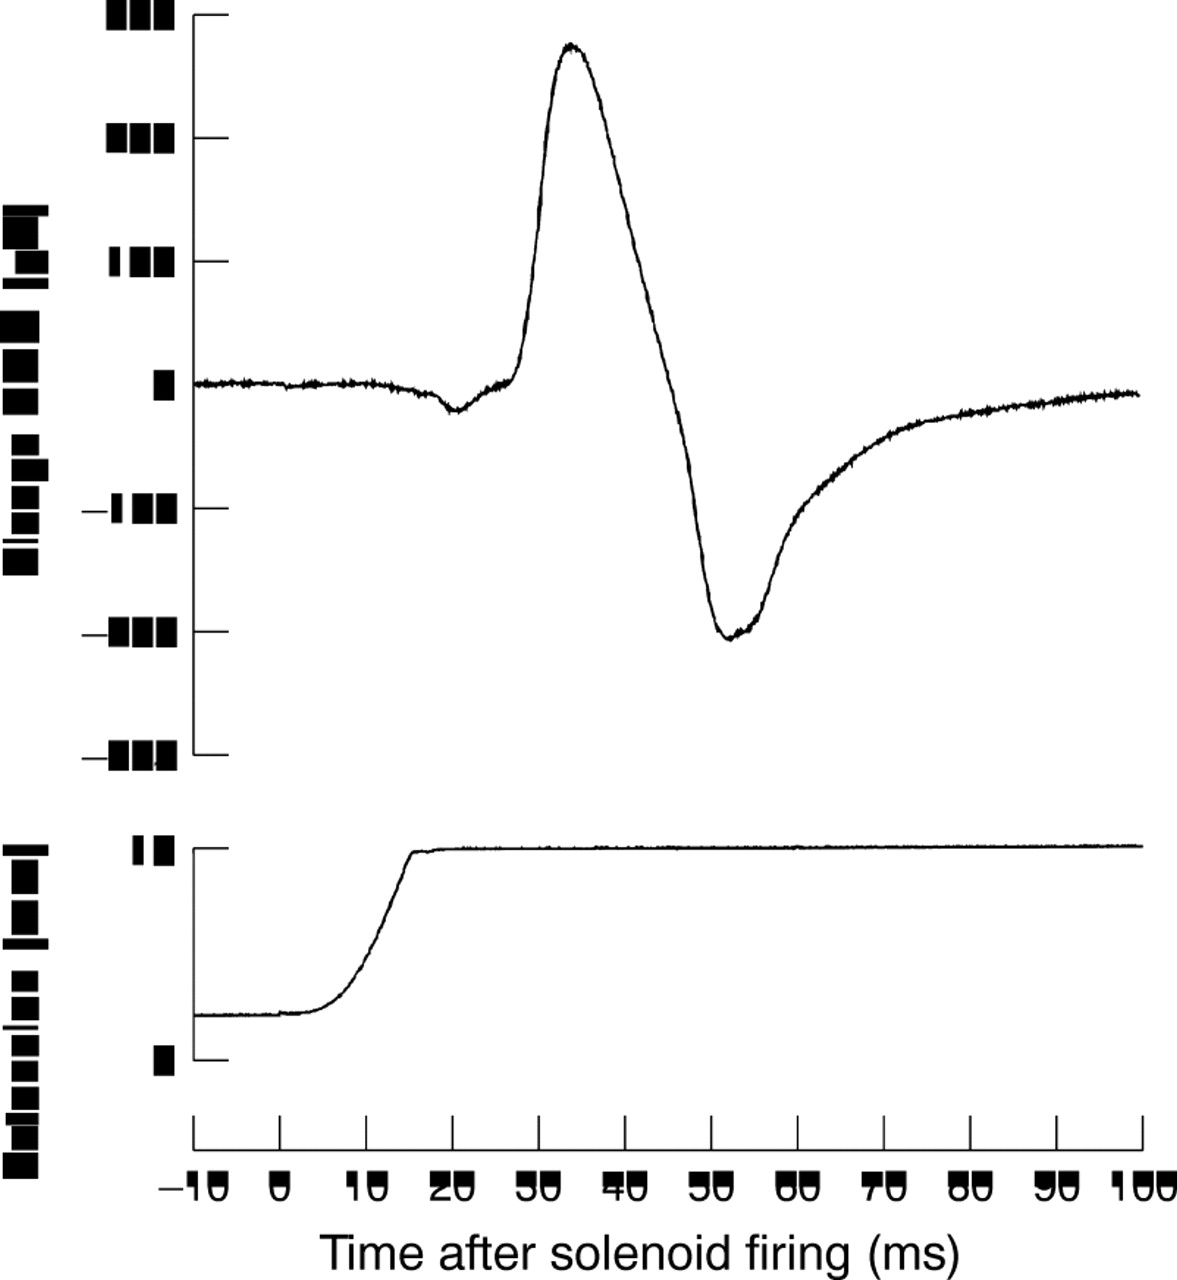 Monitoring of head injury by myotatic reflex evaluation